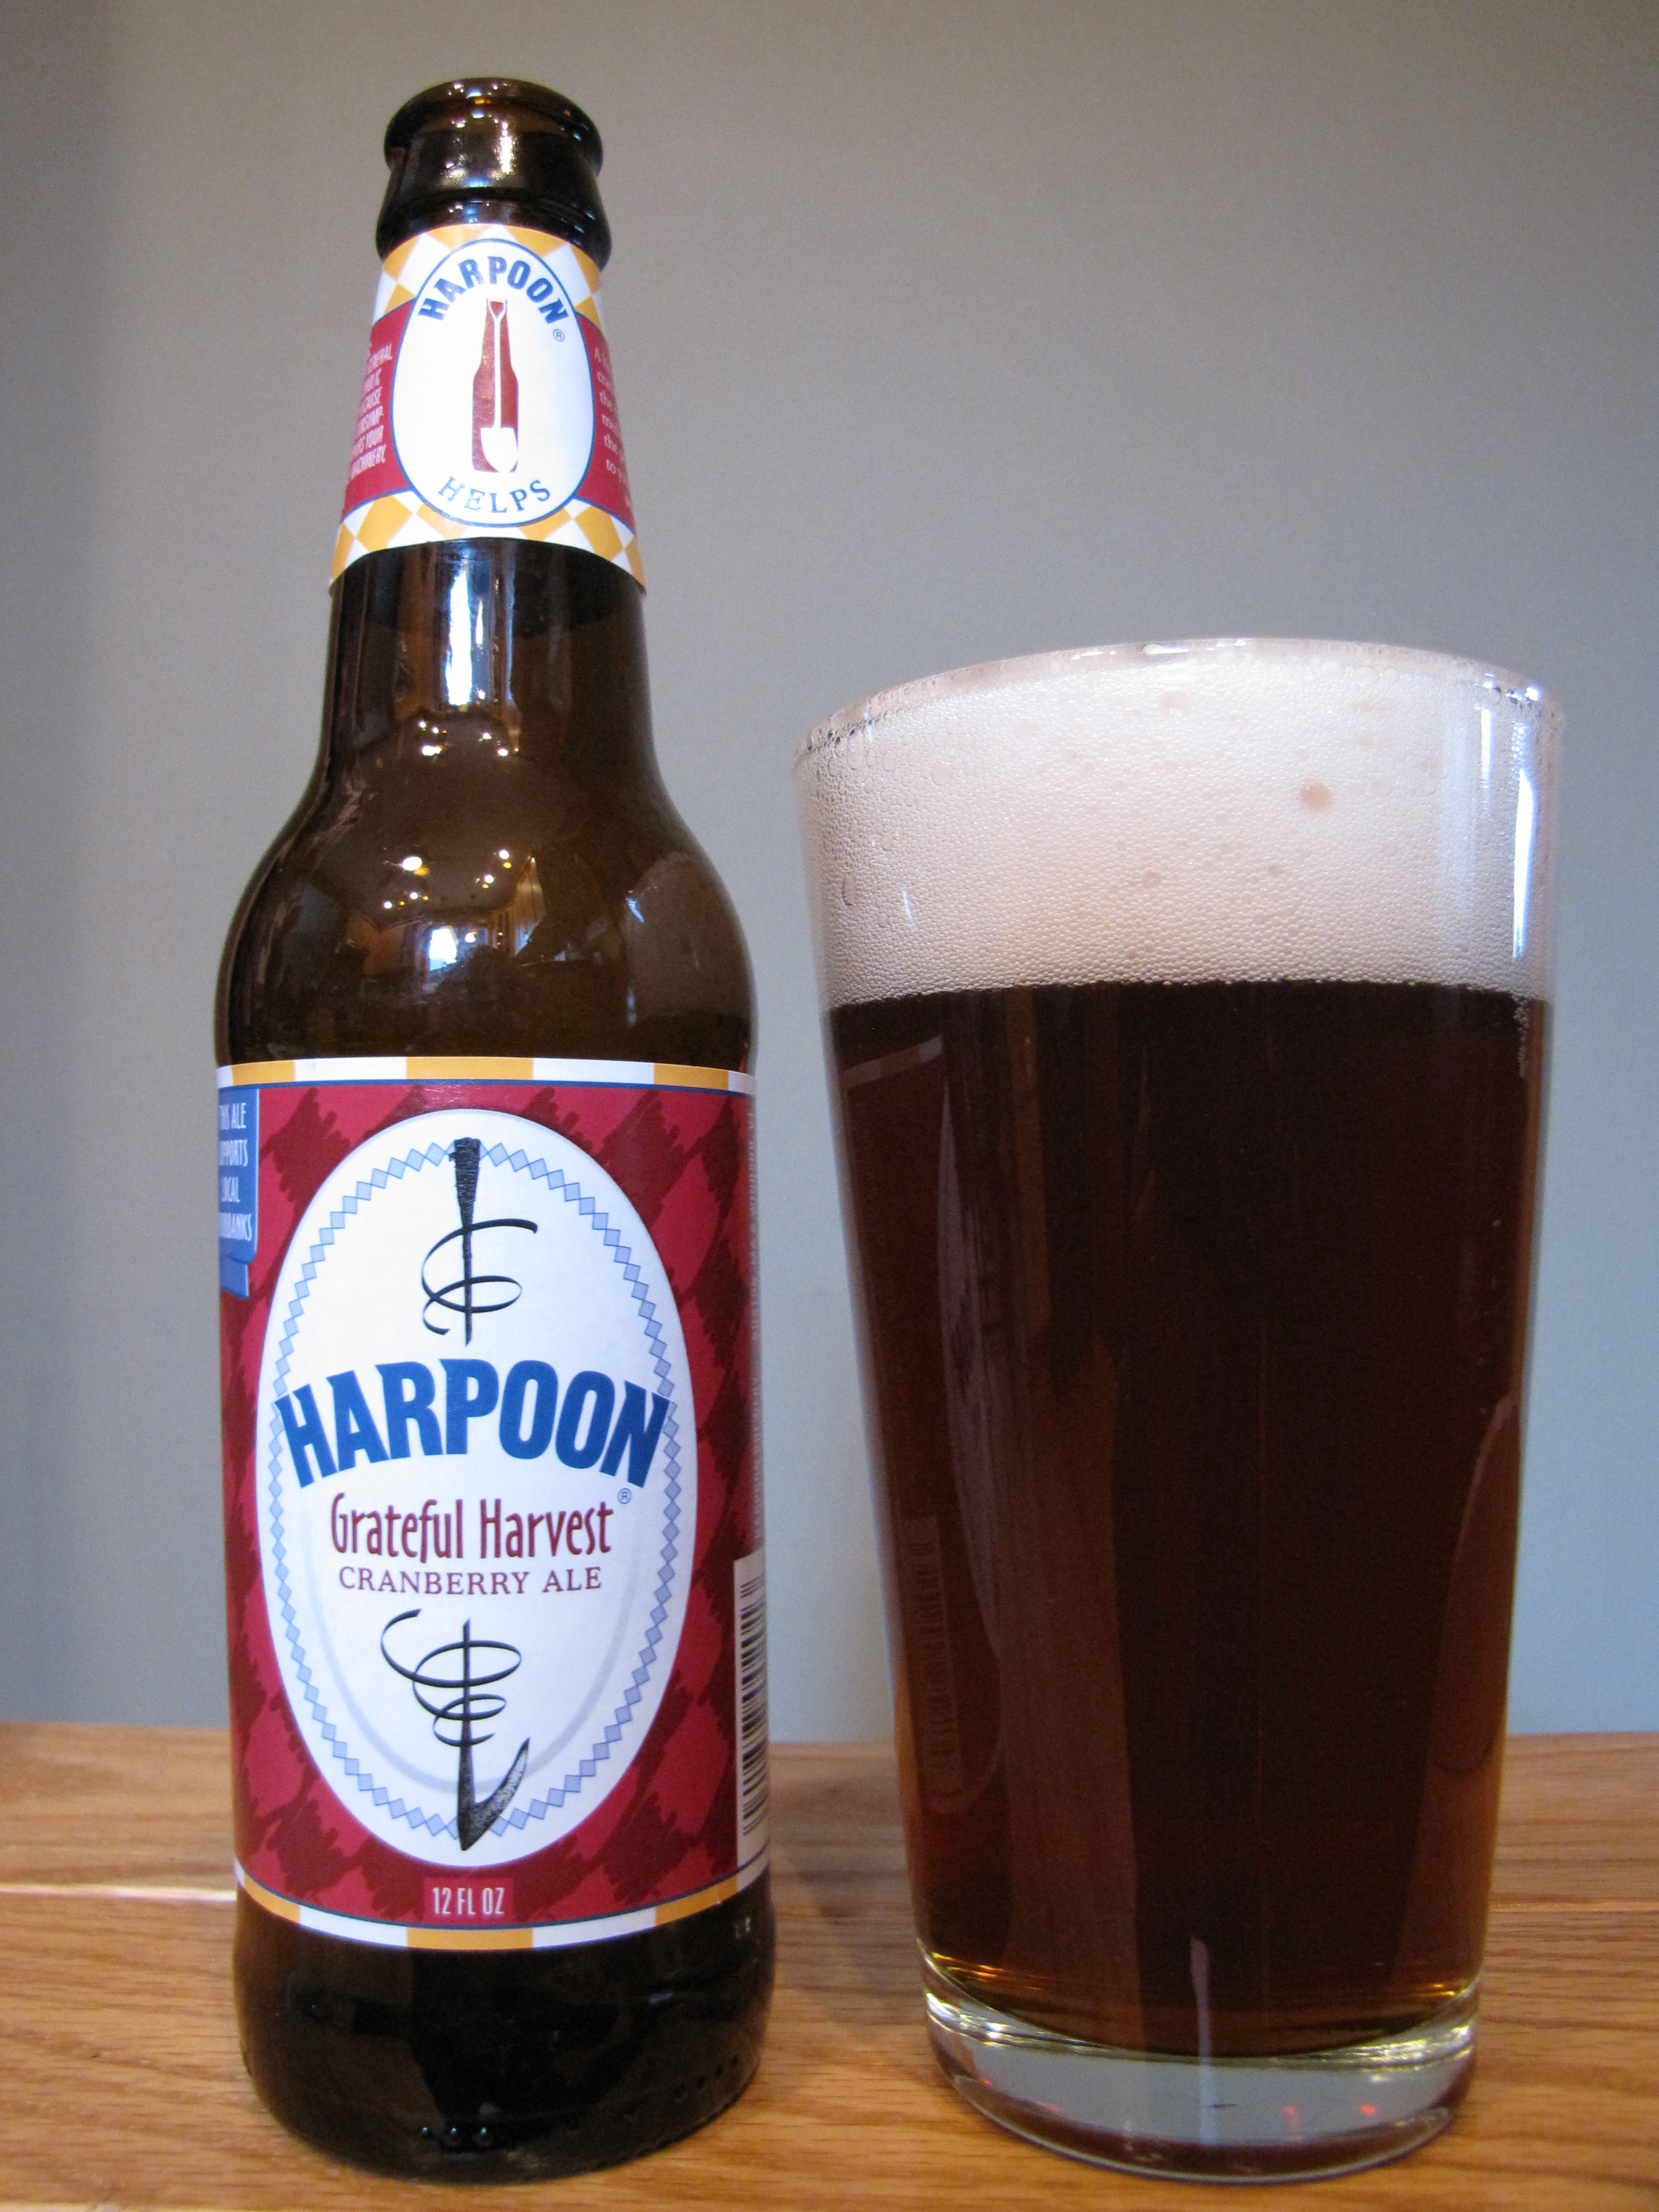 Harpoon Grateful Harvest Cranberry Ale